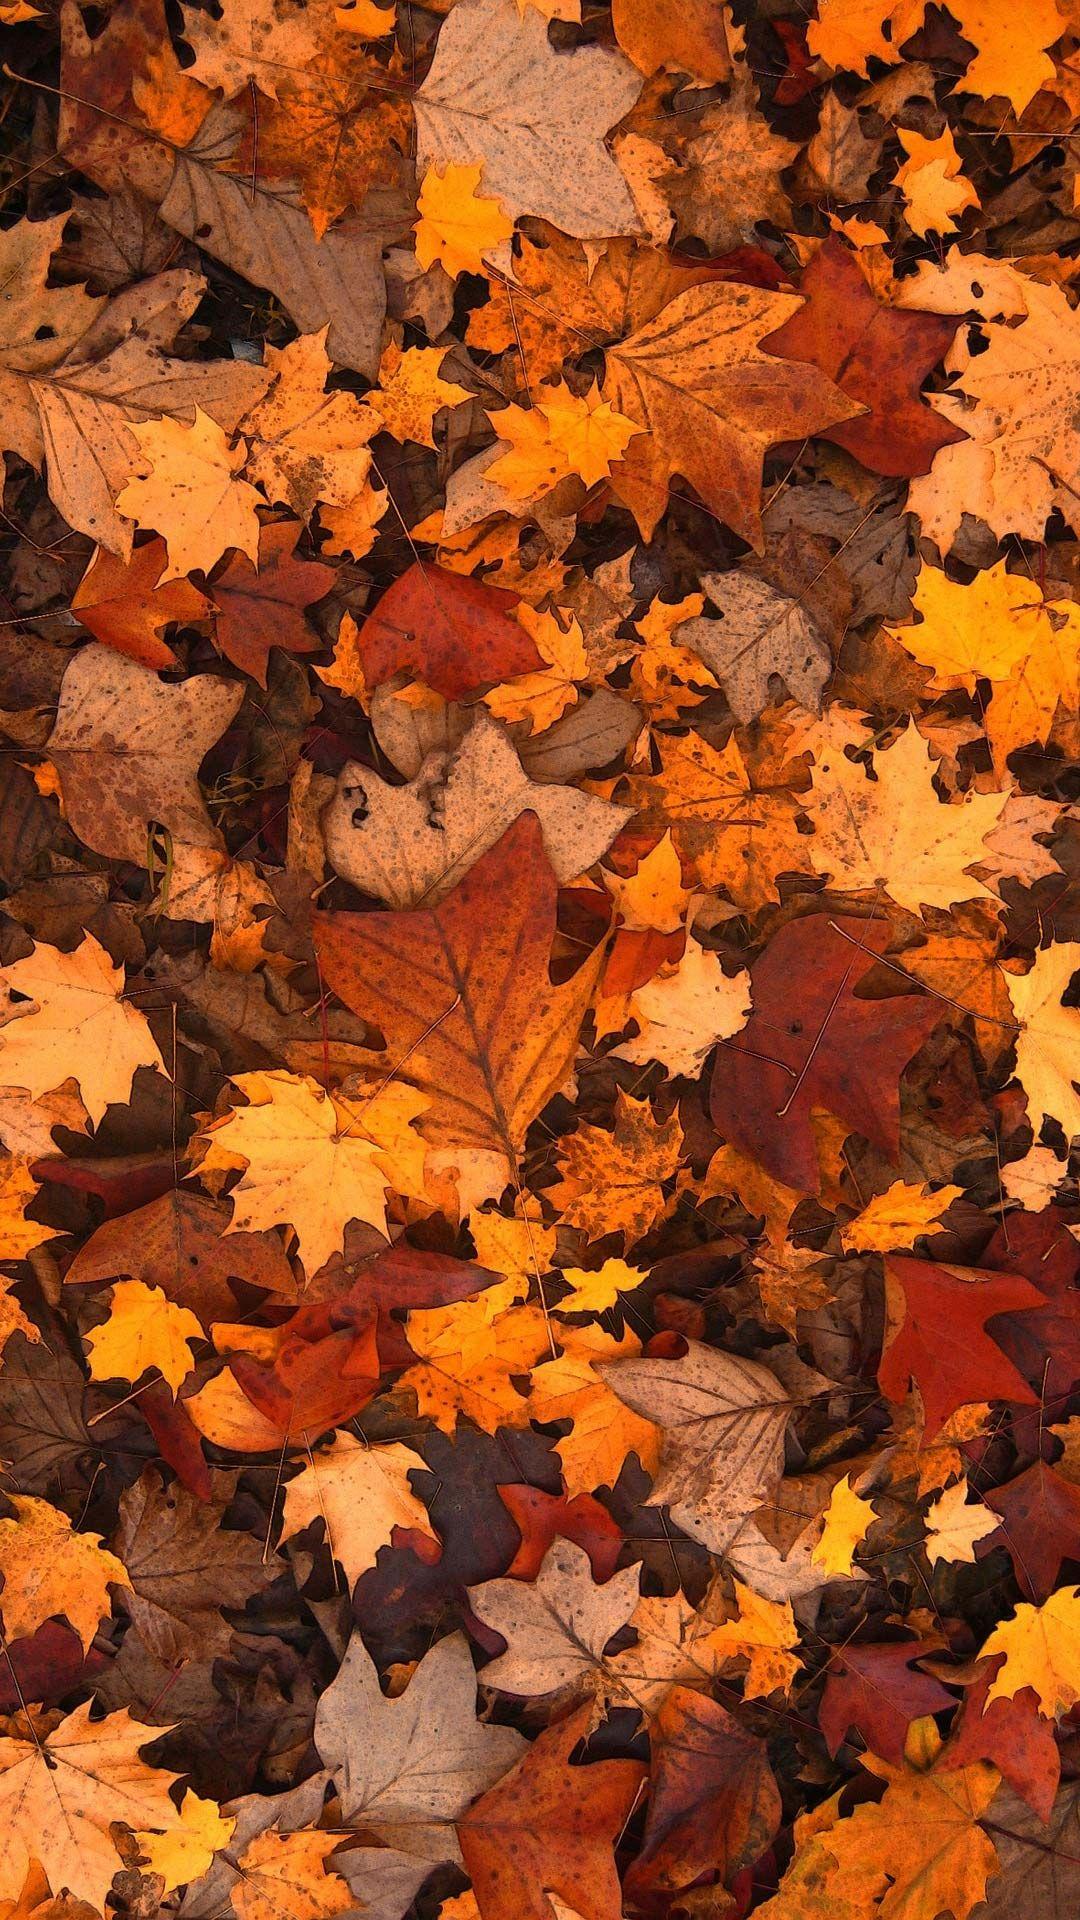 20 Fall Foliage Wallpaper Phone Backgrounds For Free Download Cute Fall Wallpaper Iphone Wallpaper Fall Fall Wallpaper